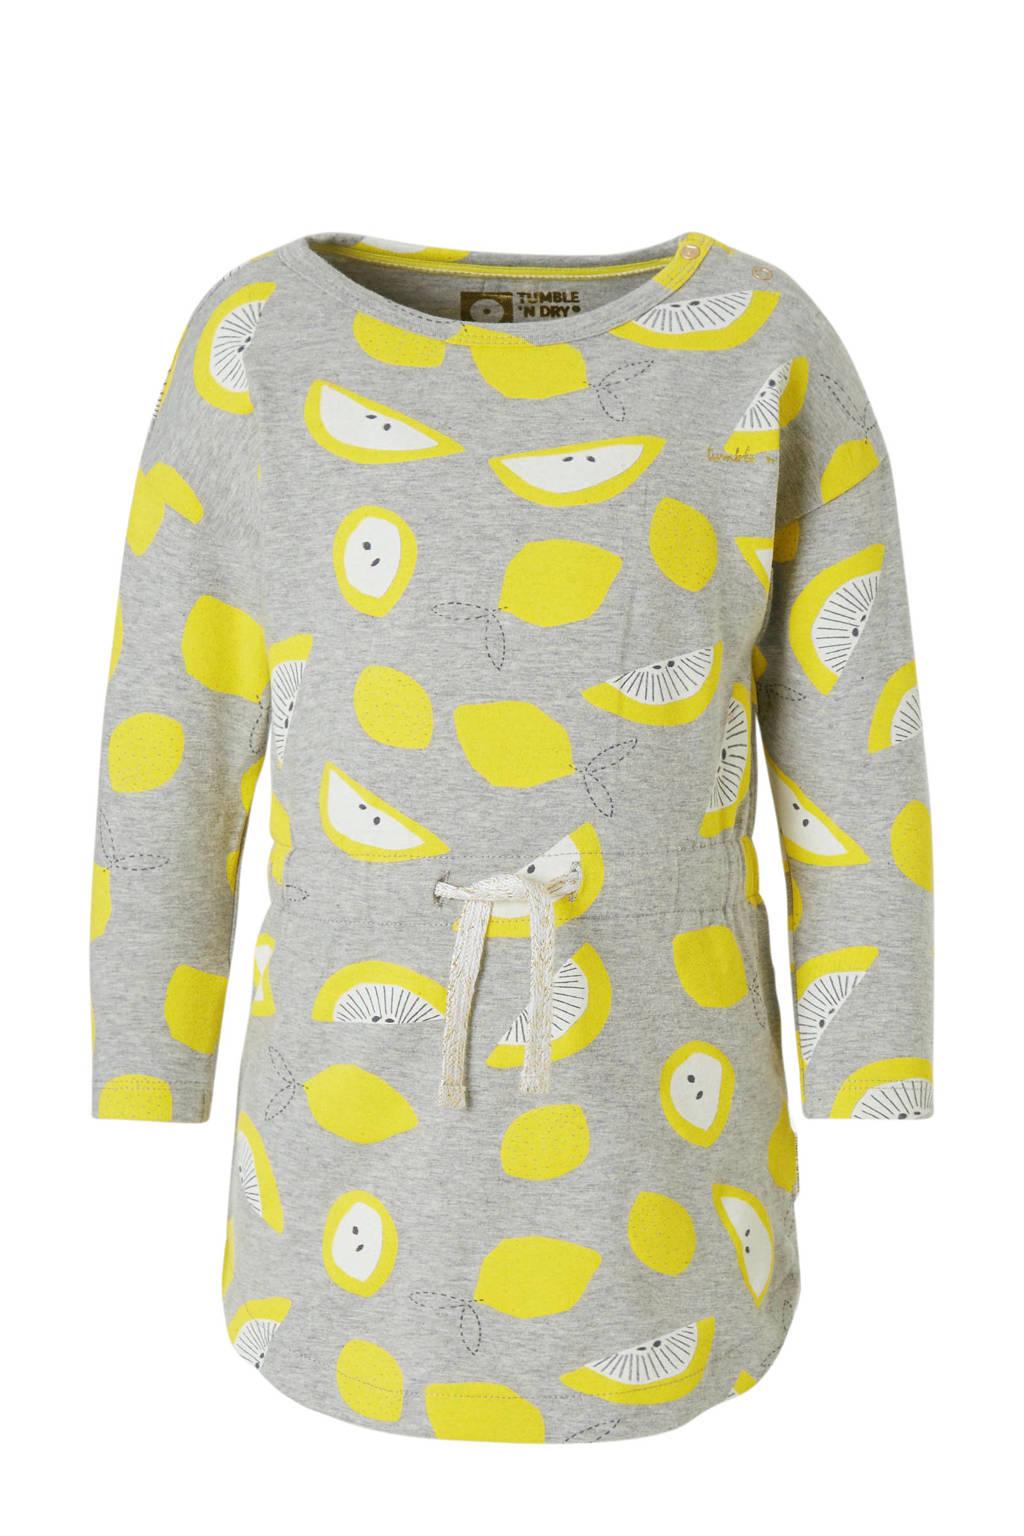 Tumble 'n Dry Lo jurk Elvis met citroenenprint, Lichtgrijs melange/ geel